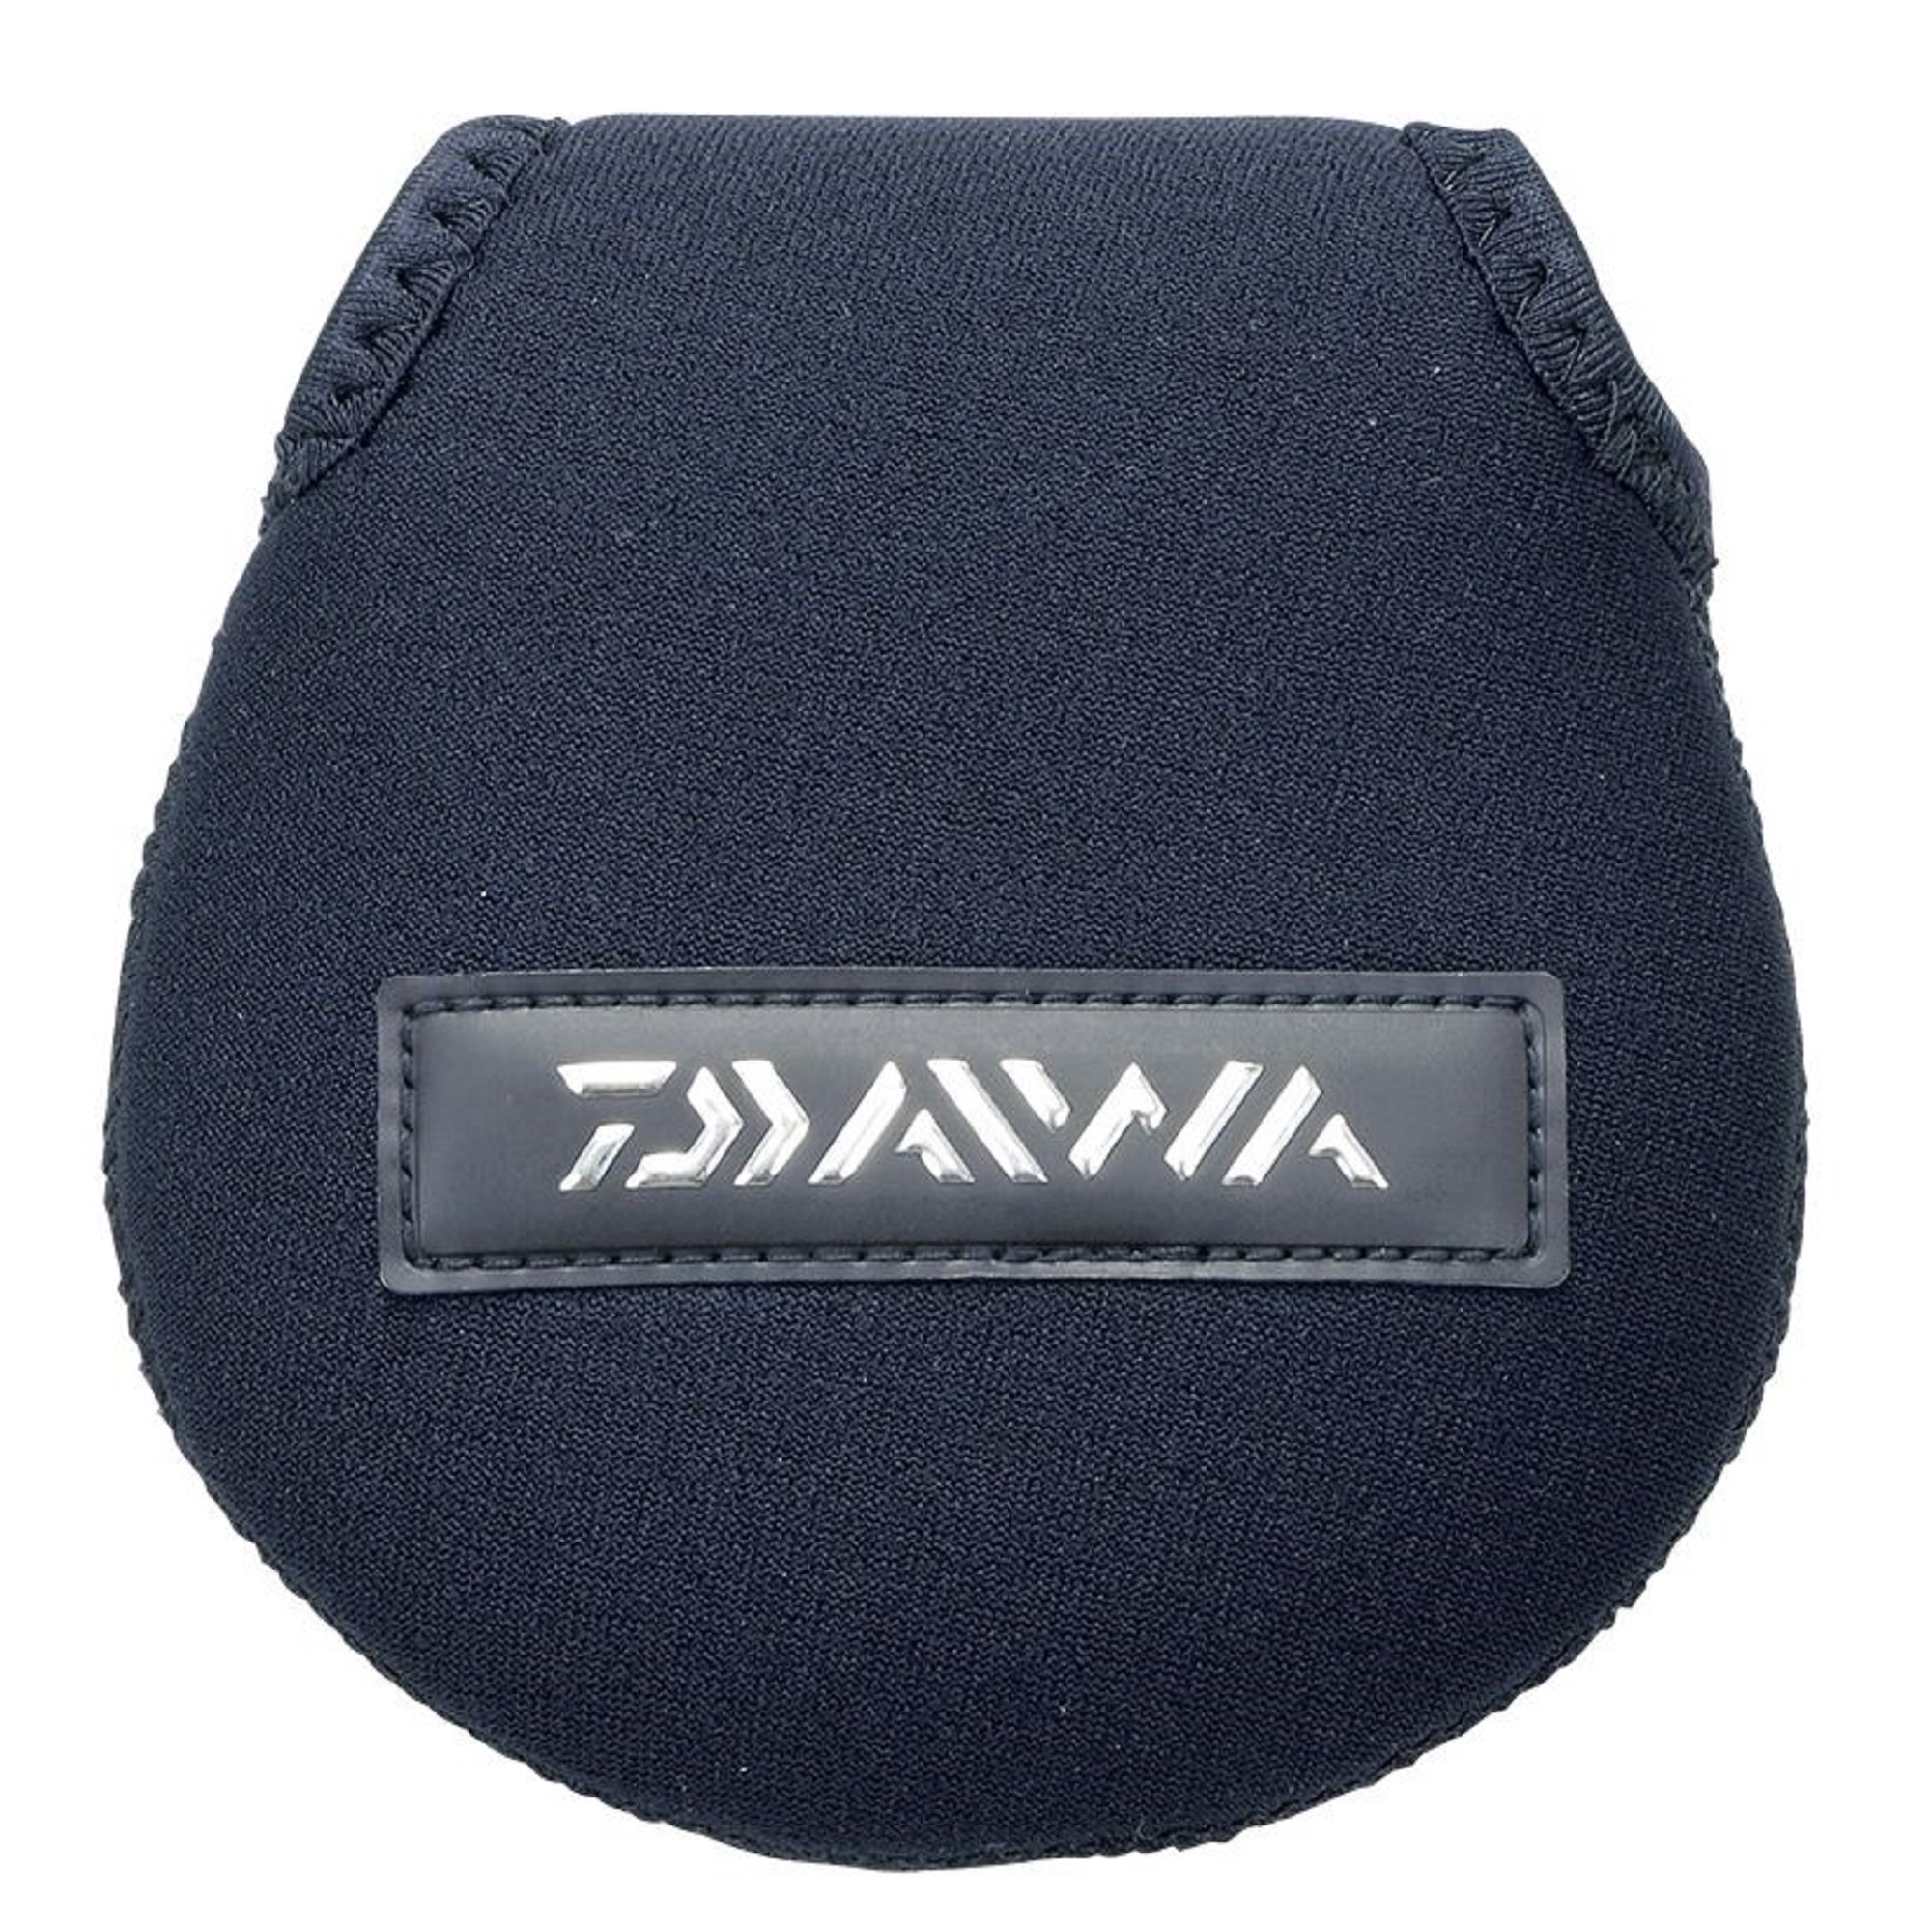 Sale Daiwa CV-M Size M Baitcast Reel Cover Size 200-400 (7054)